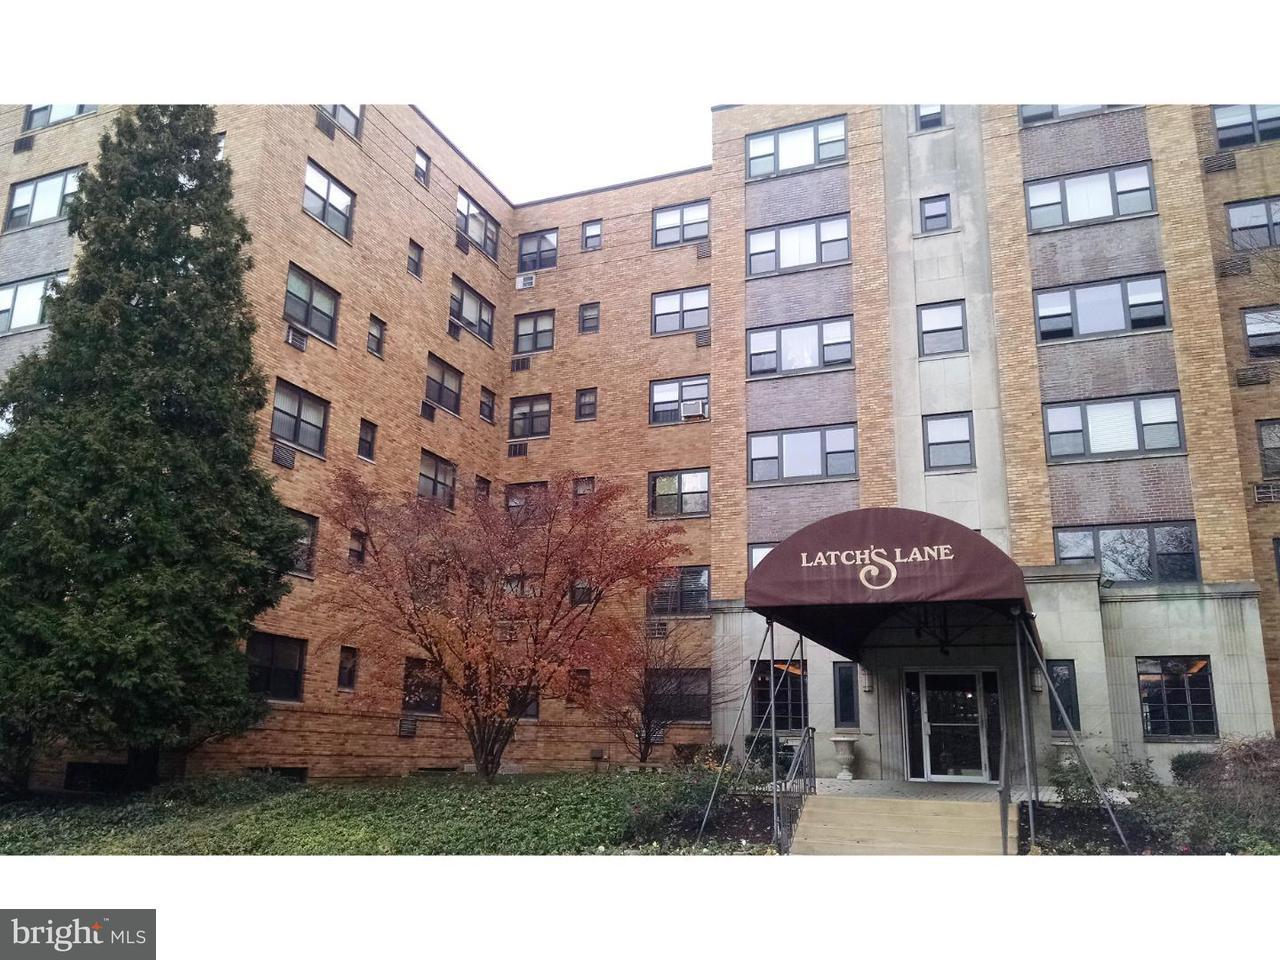 Condominium for Rent at 40 OLD LANCASTER RD #101 Merion Station, Pennsylvania 19066 United States